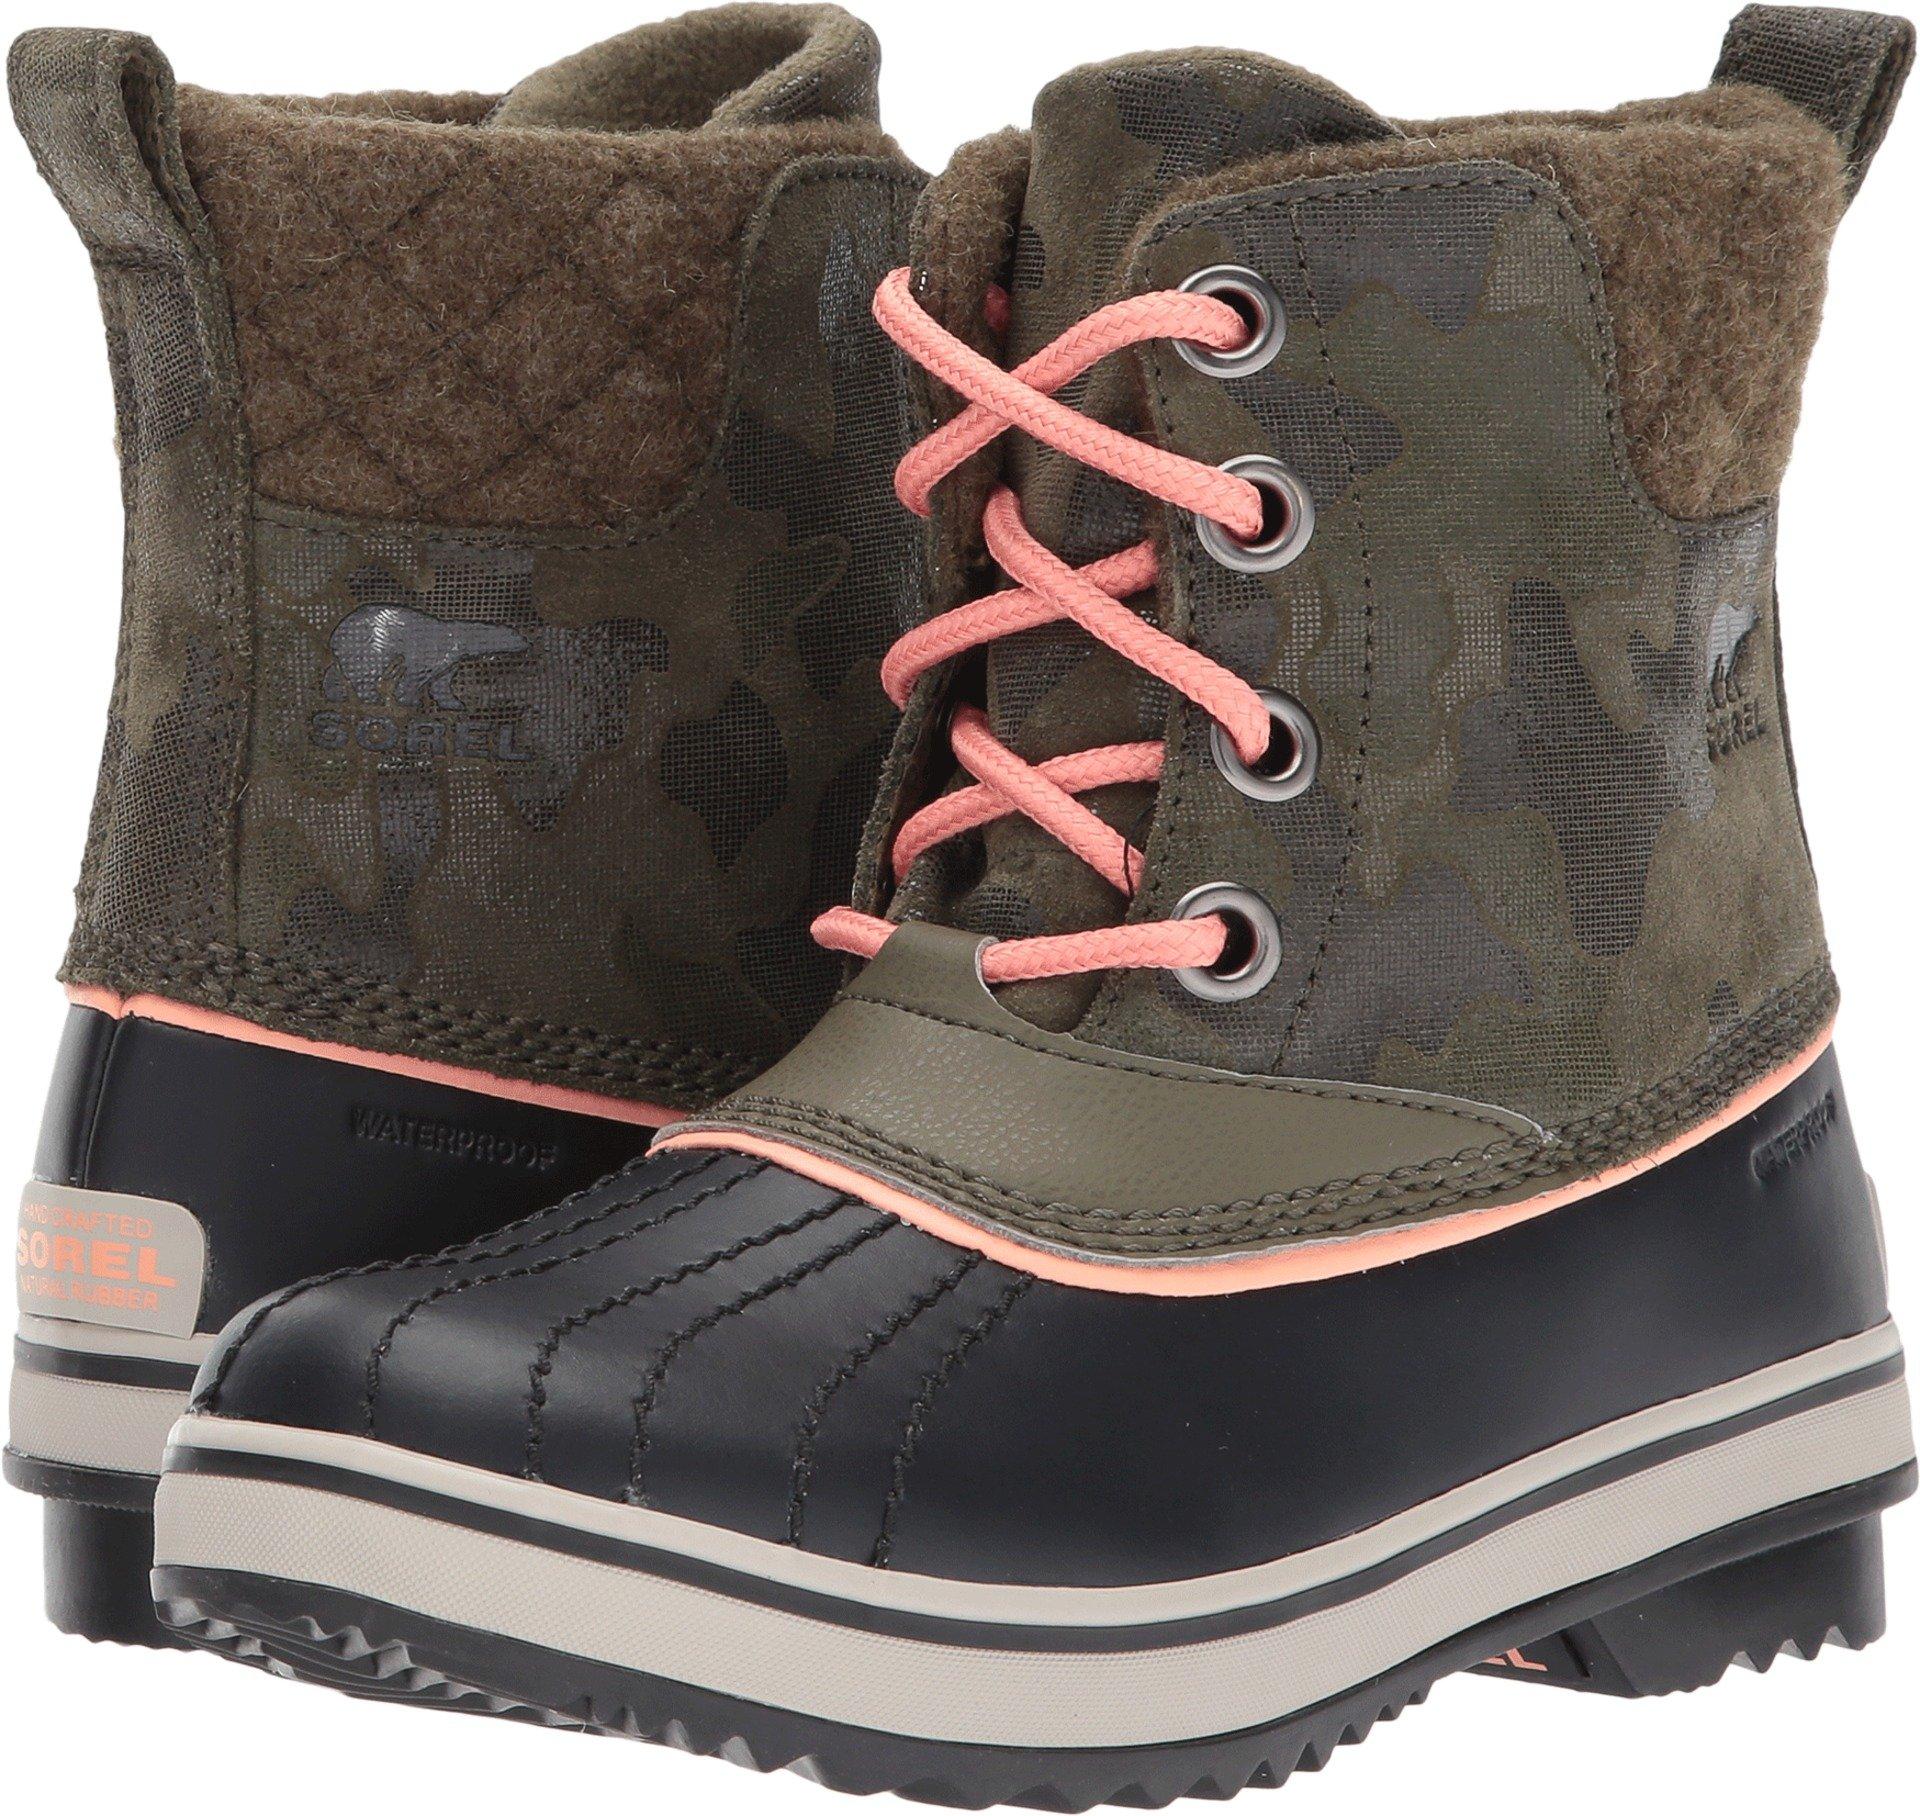 SOREL Slimpack II Lace Boot - Girls' Nori/Summer Peach, 7.0